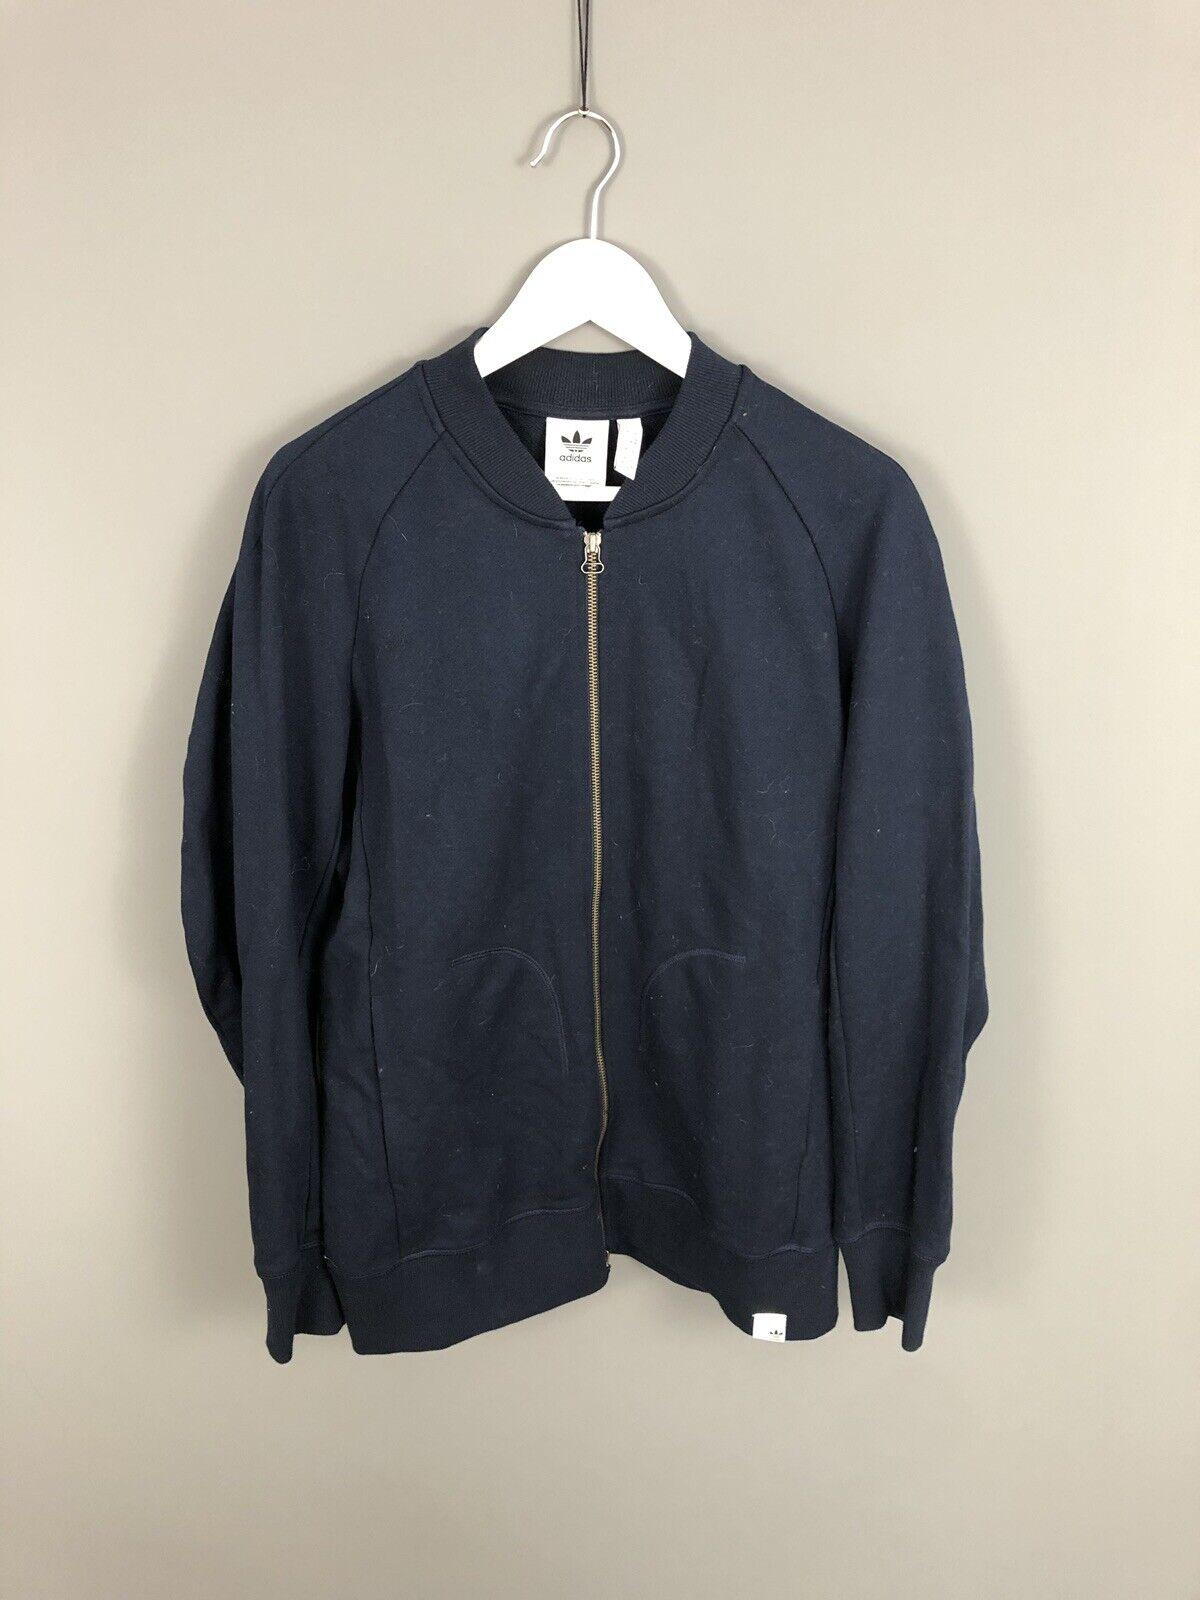 ADIDAS Full Zip Sweatshirt - Medium - Navy - Great Condition - Men's